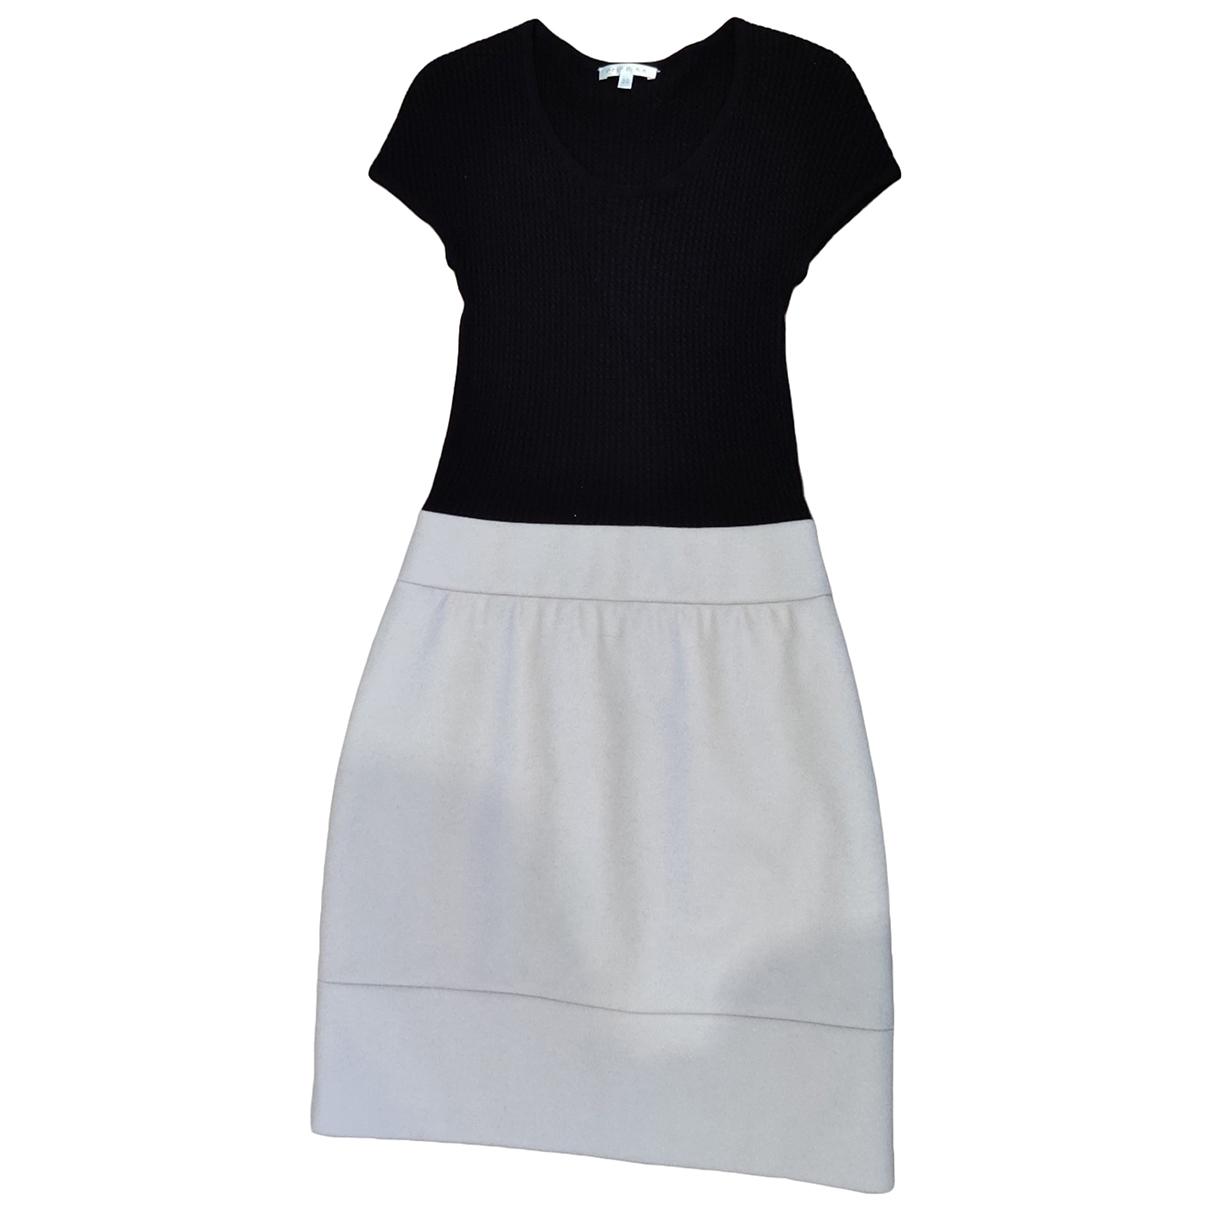 Paule Ka \N Black Wool dress for Women 36 FR